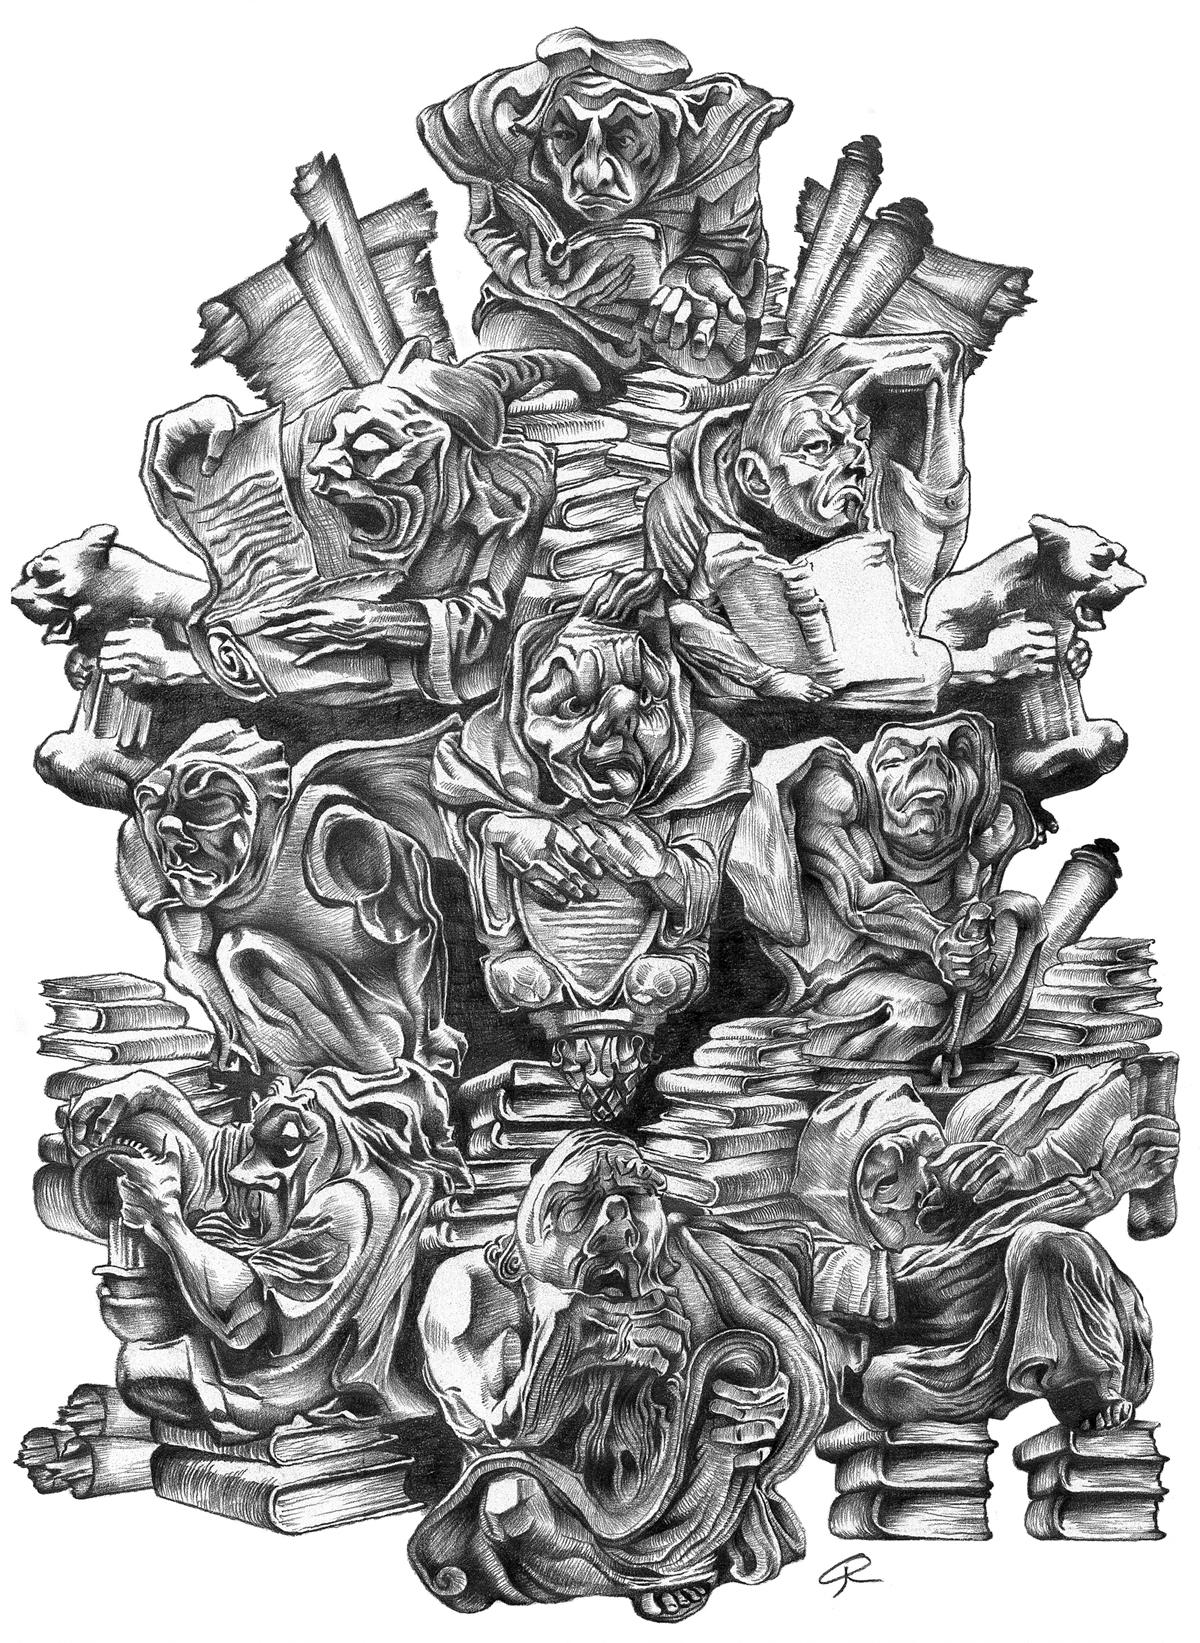 Pencil illustration of wise men seeking knowledge.